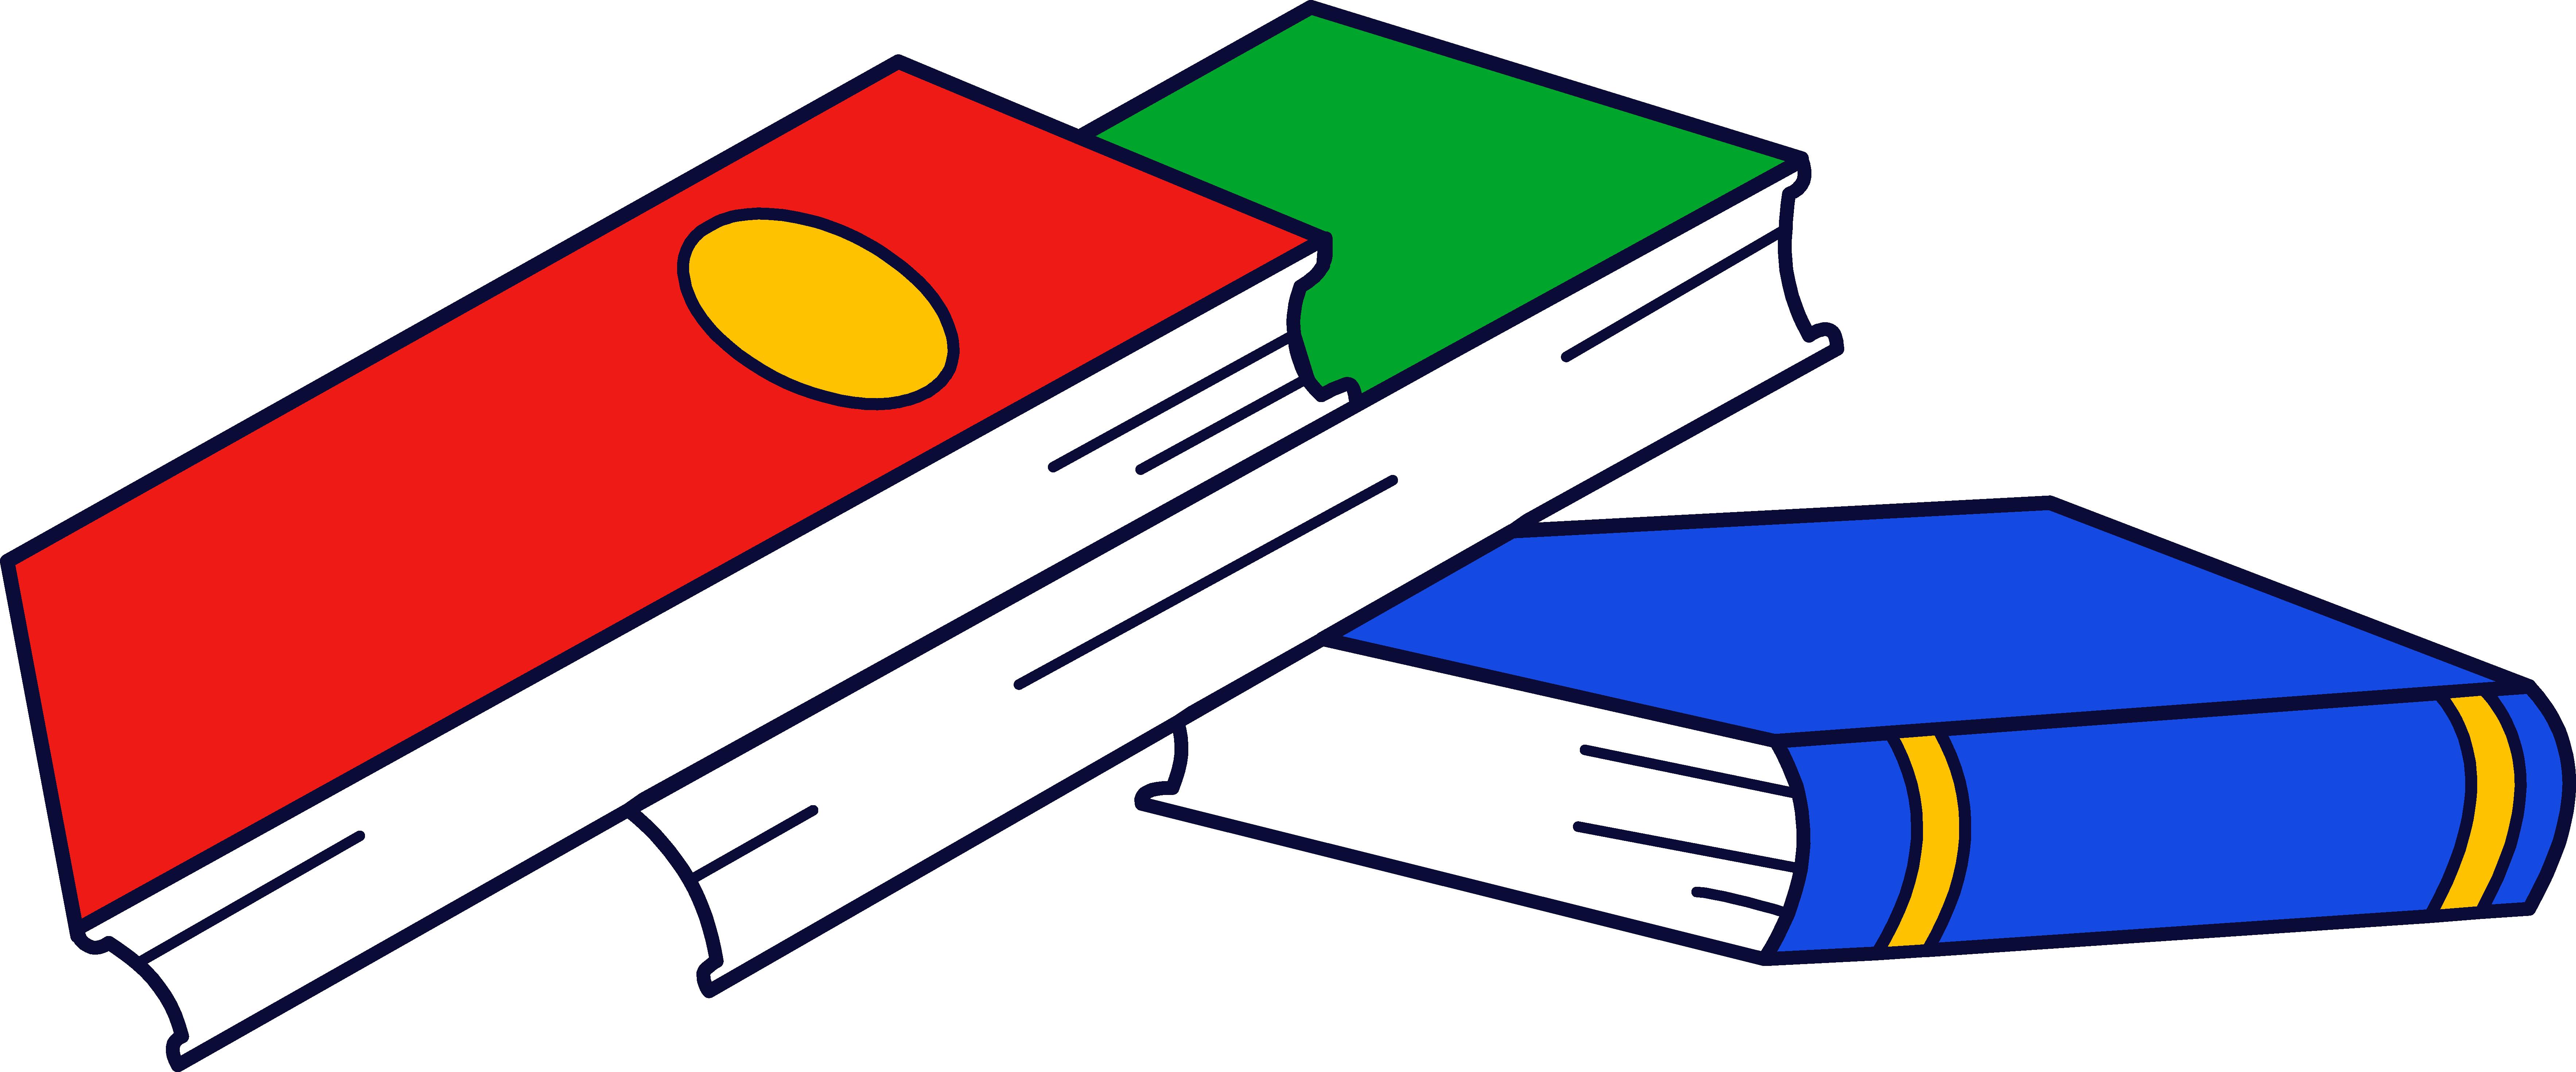 Free Clip Art Of Books - ClipArt Best